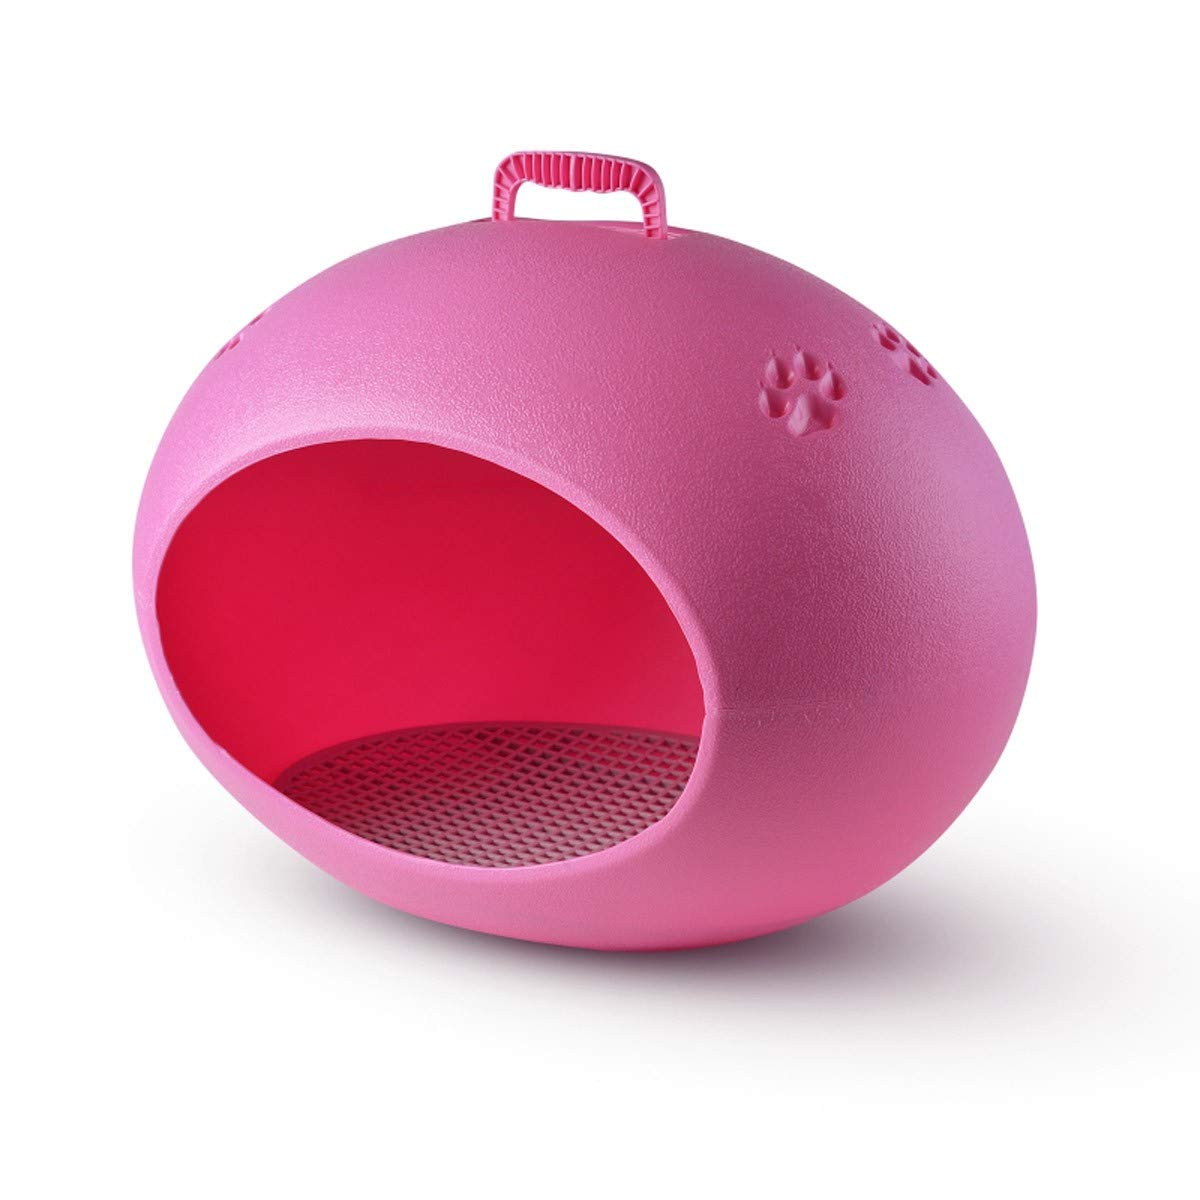 A LBTSQUniversal Waterproof Plastic EggShaped Cat'S Nest Dog'S Nest Dog'S House NoDemolition Outdoor Pet'S Nest Pet Supplies Dog Bed Dog House